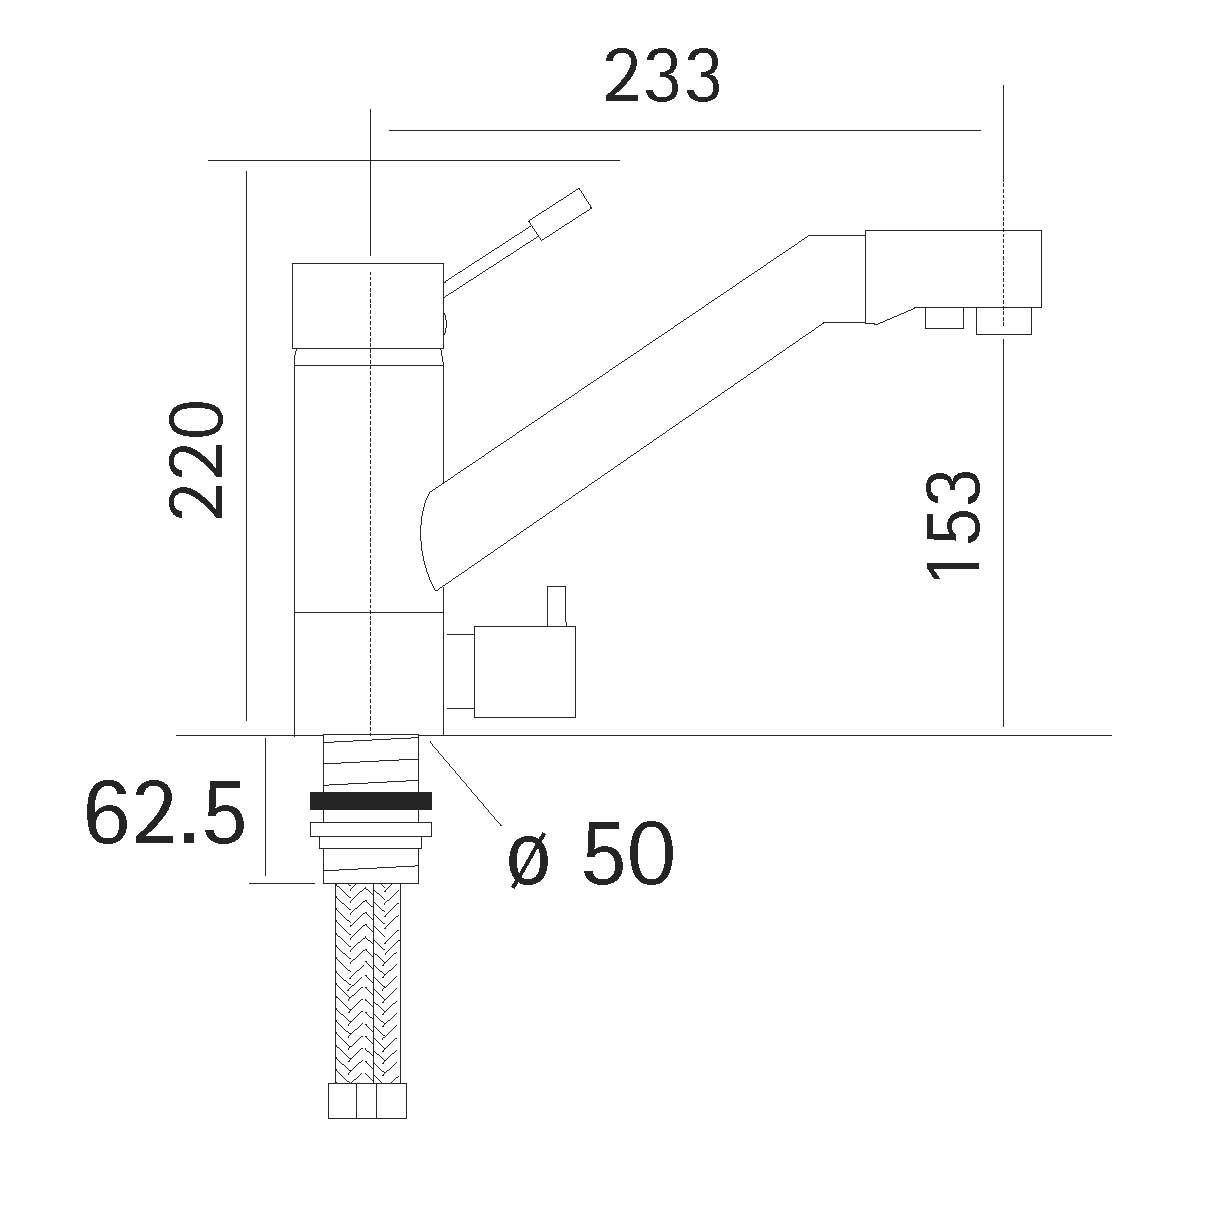 3 wege k chenarmatur montreal inox edelstahl wasserhaus. Black Bedroom Furniture Sets. Home Design Ideas